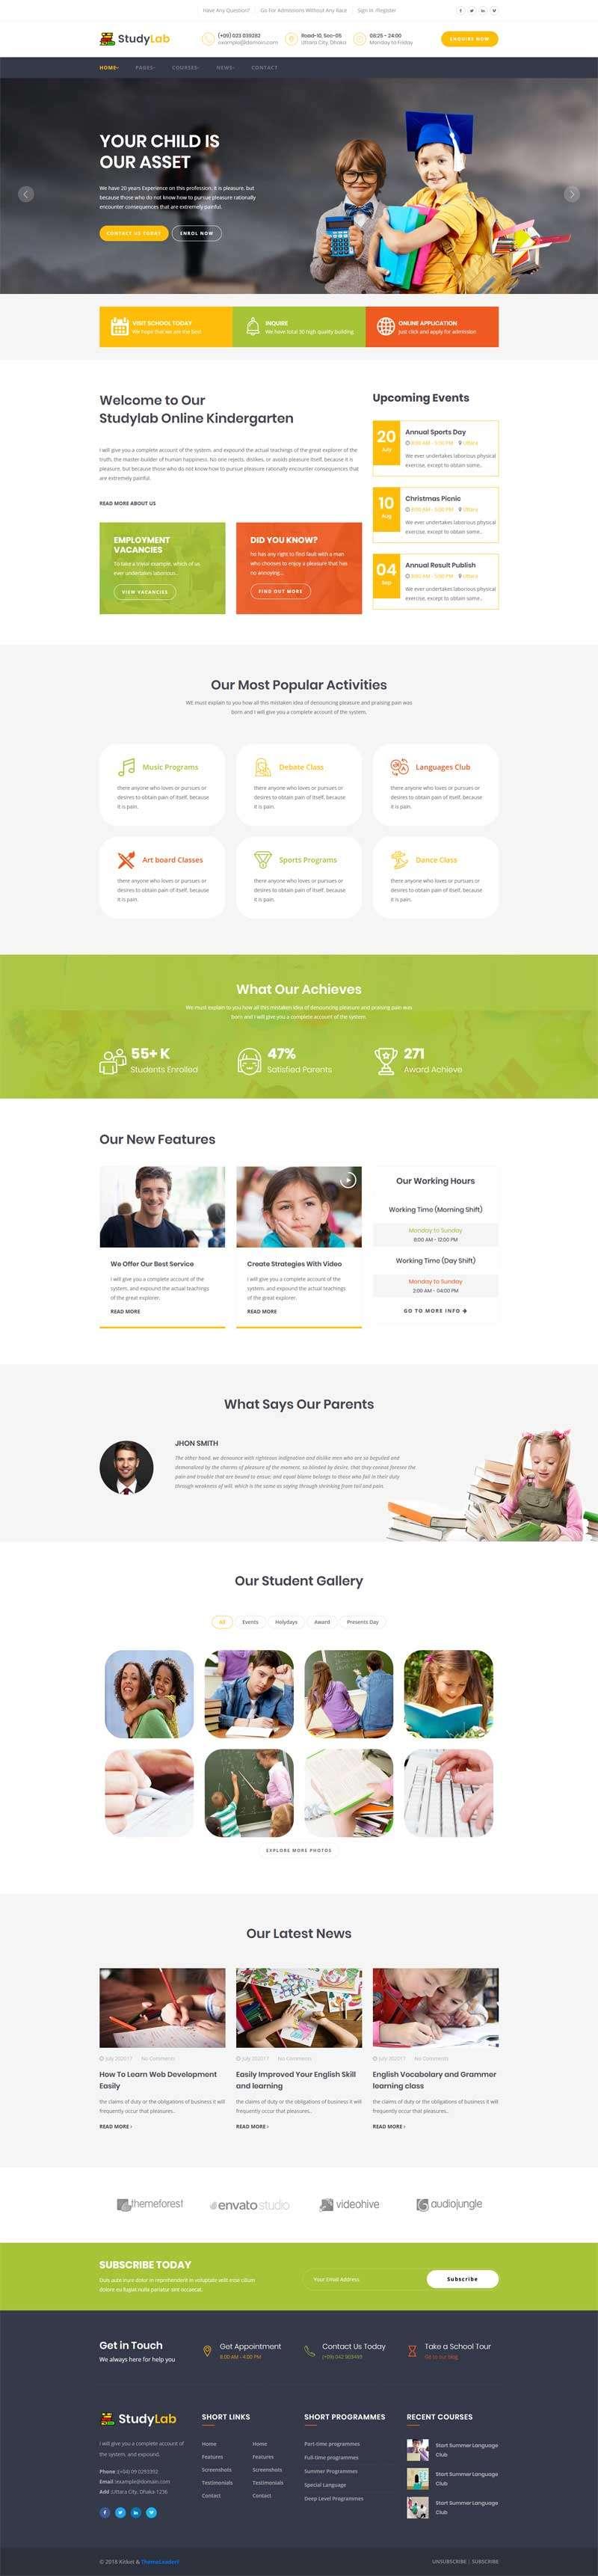 bootstrap小学生课程培训教育网站模板